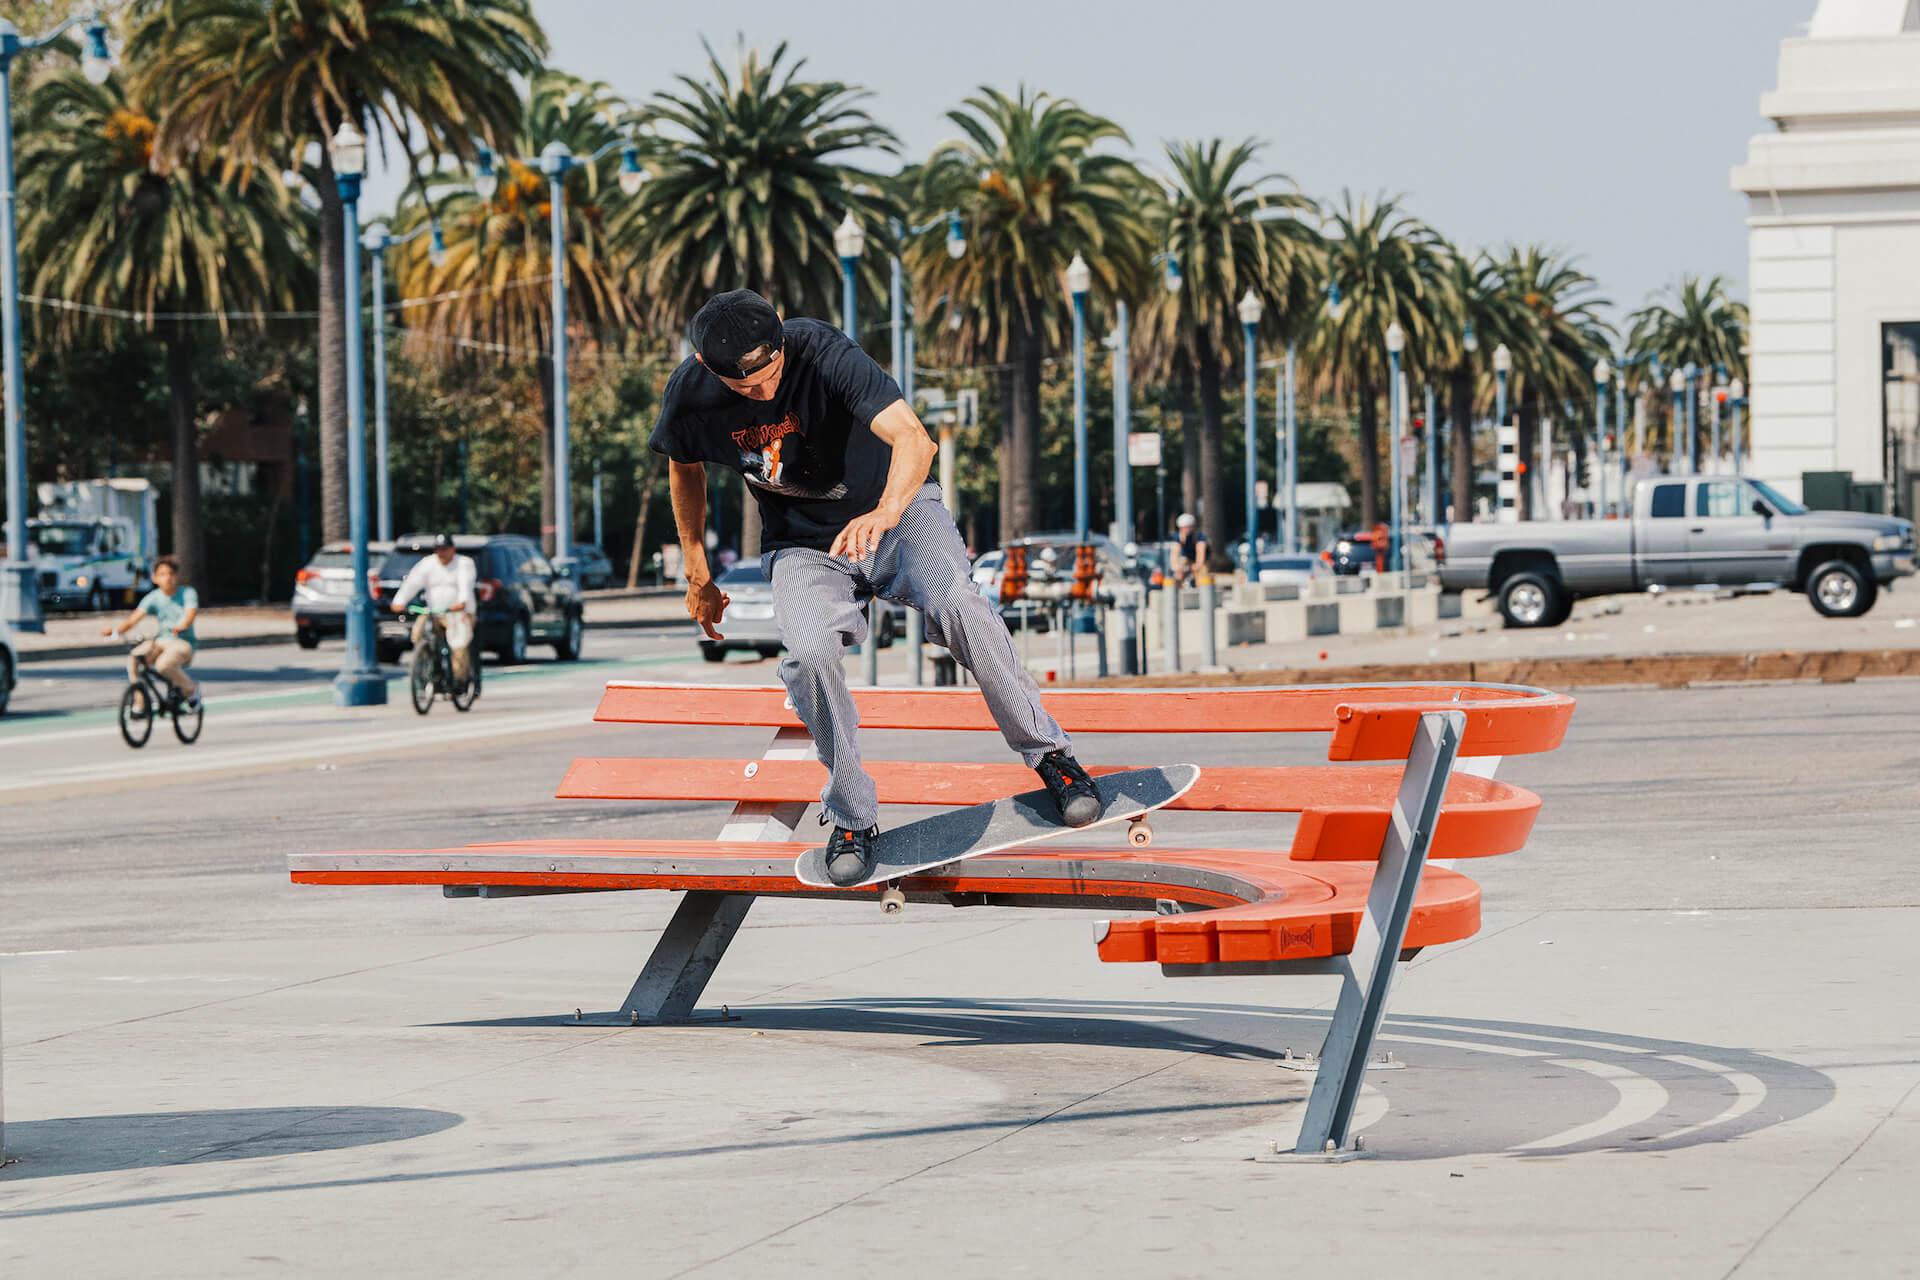 adidas SkateboardingとTHRASHERがコラボ!プロスケーターTyshawn Jonesのシグネチャーモデル&新型SUPERSTARが登場 life201126_adidas_skateboarding_16